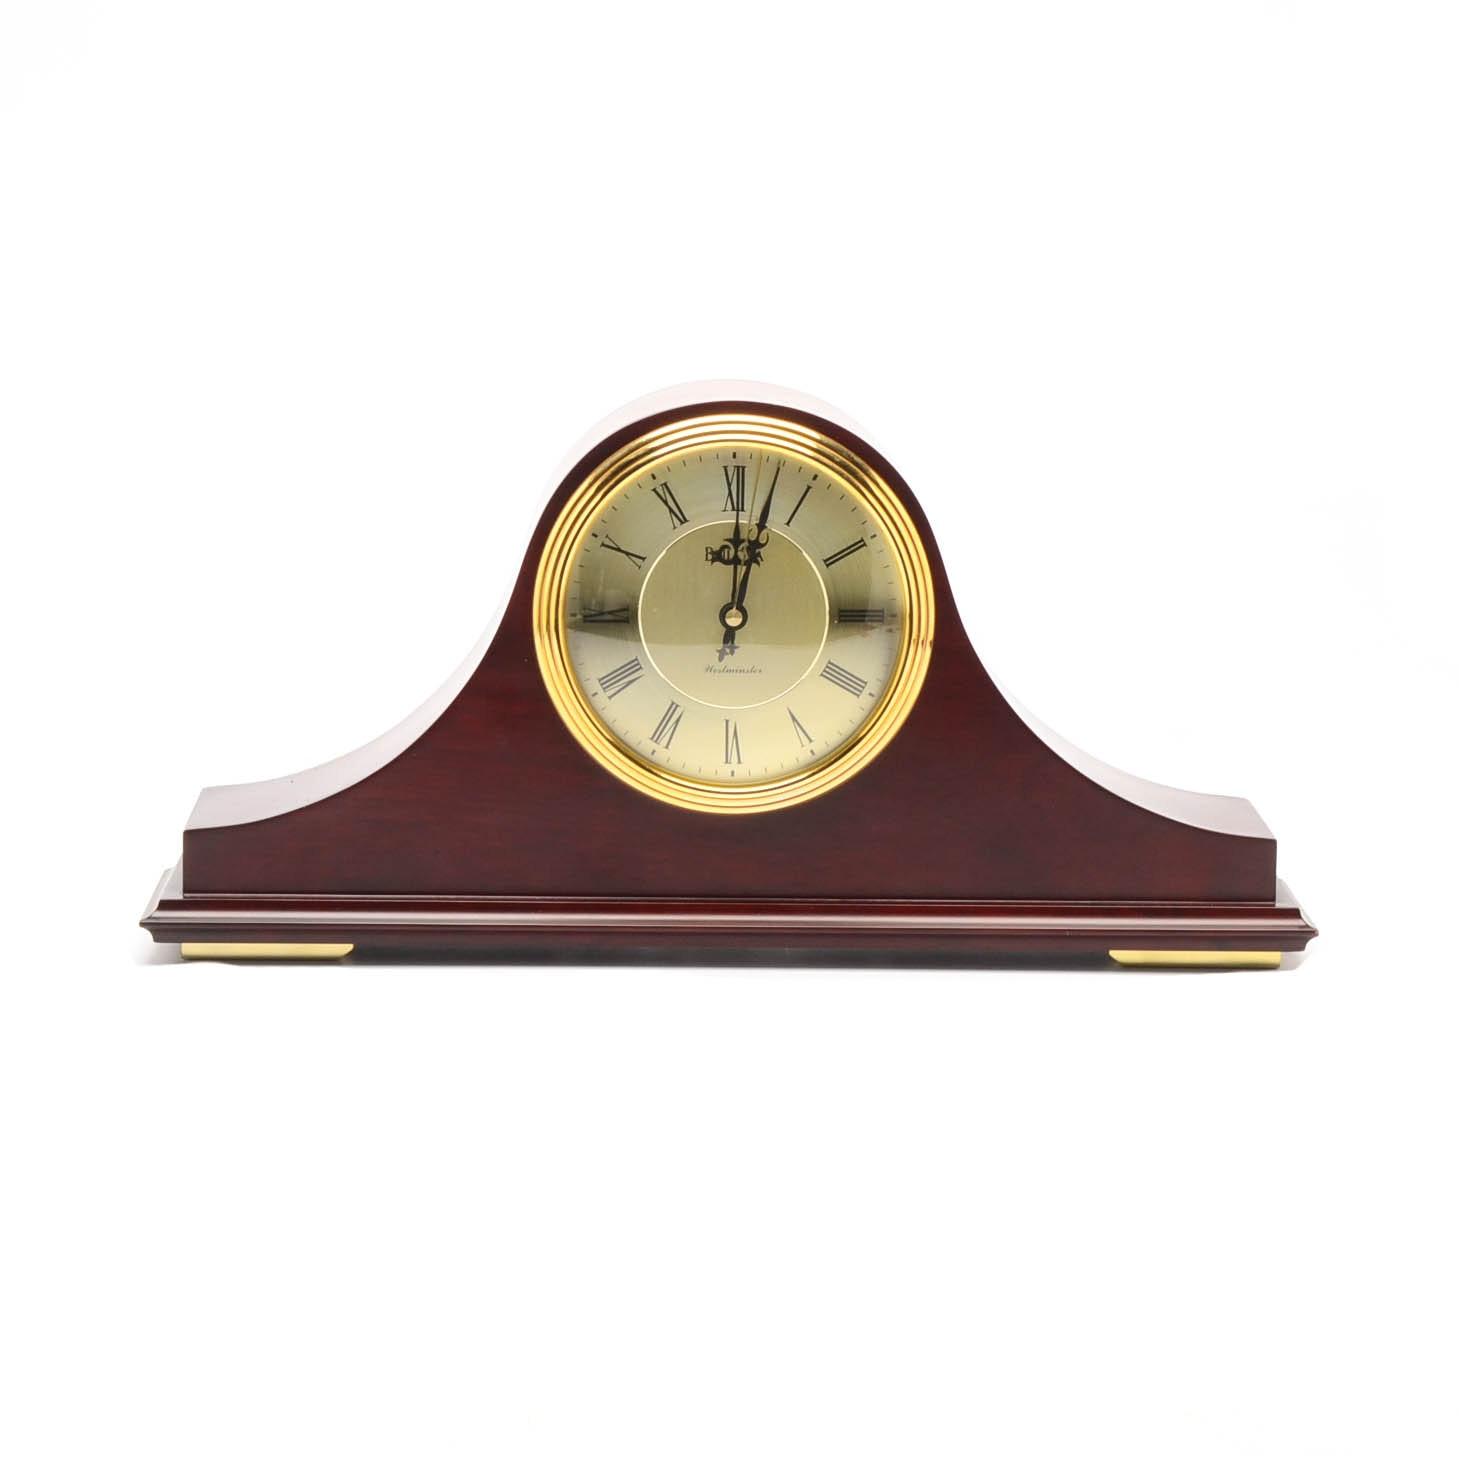 Bulova Westminster Mantle Clock